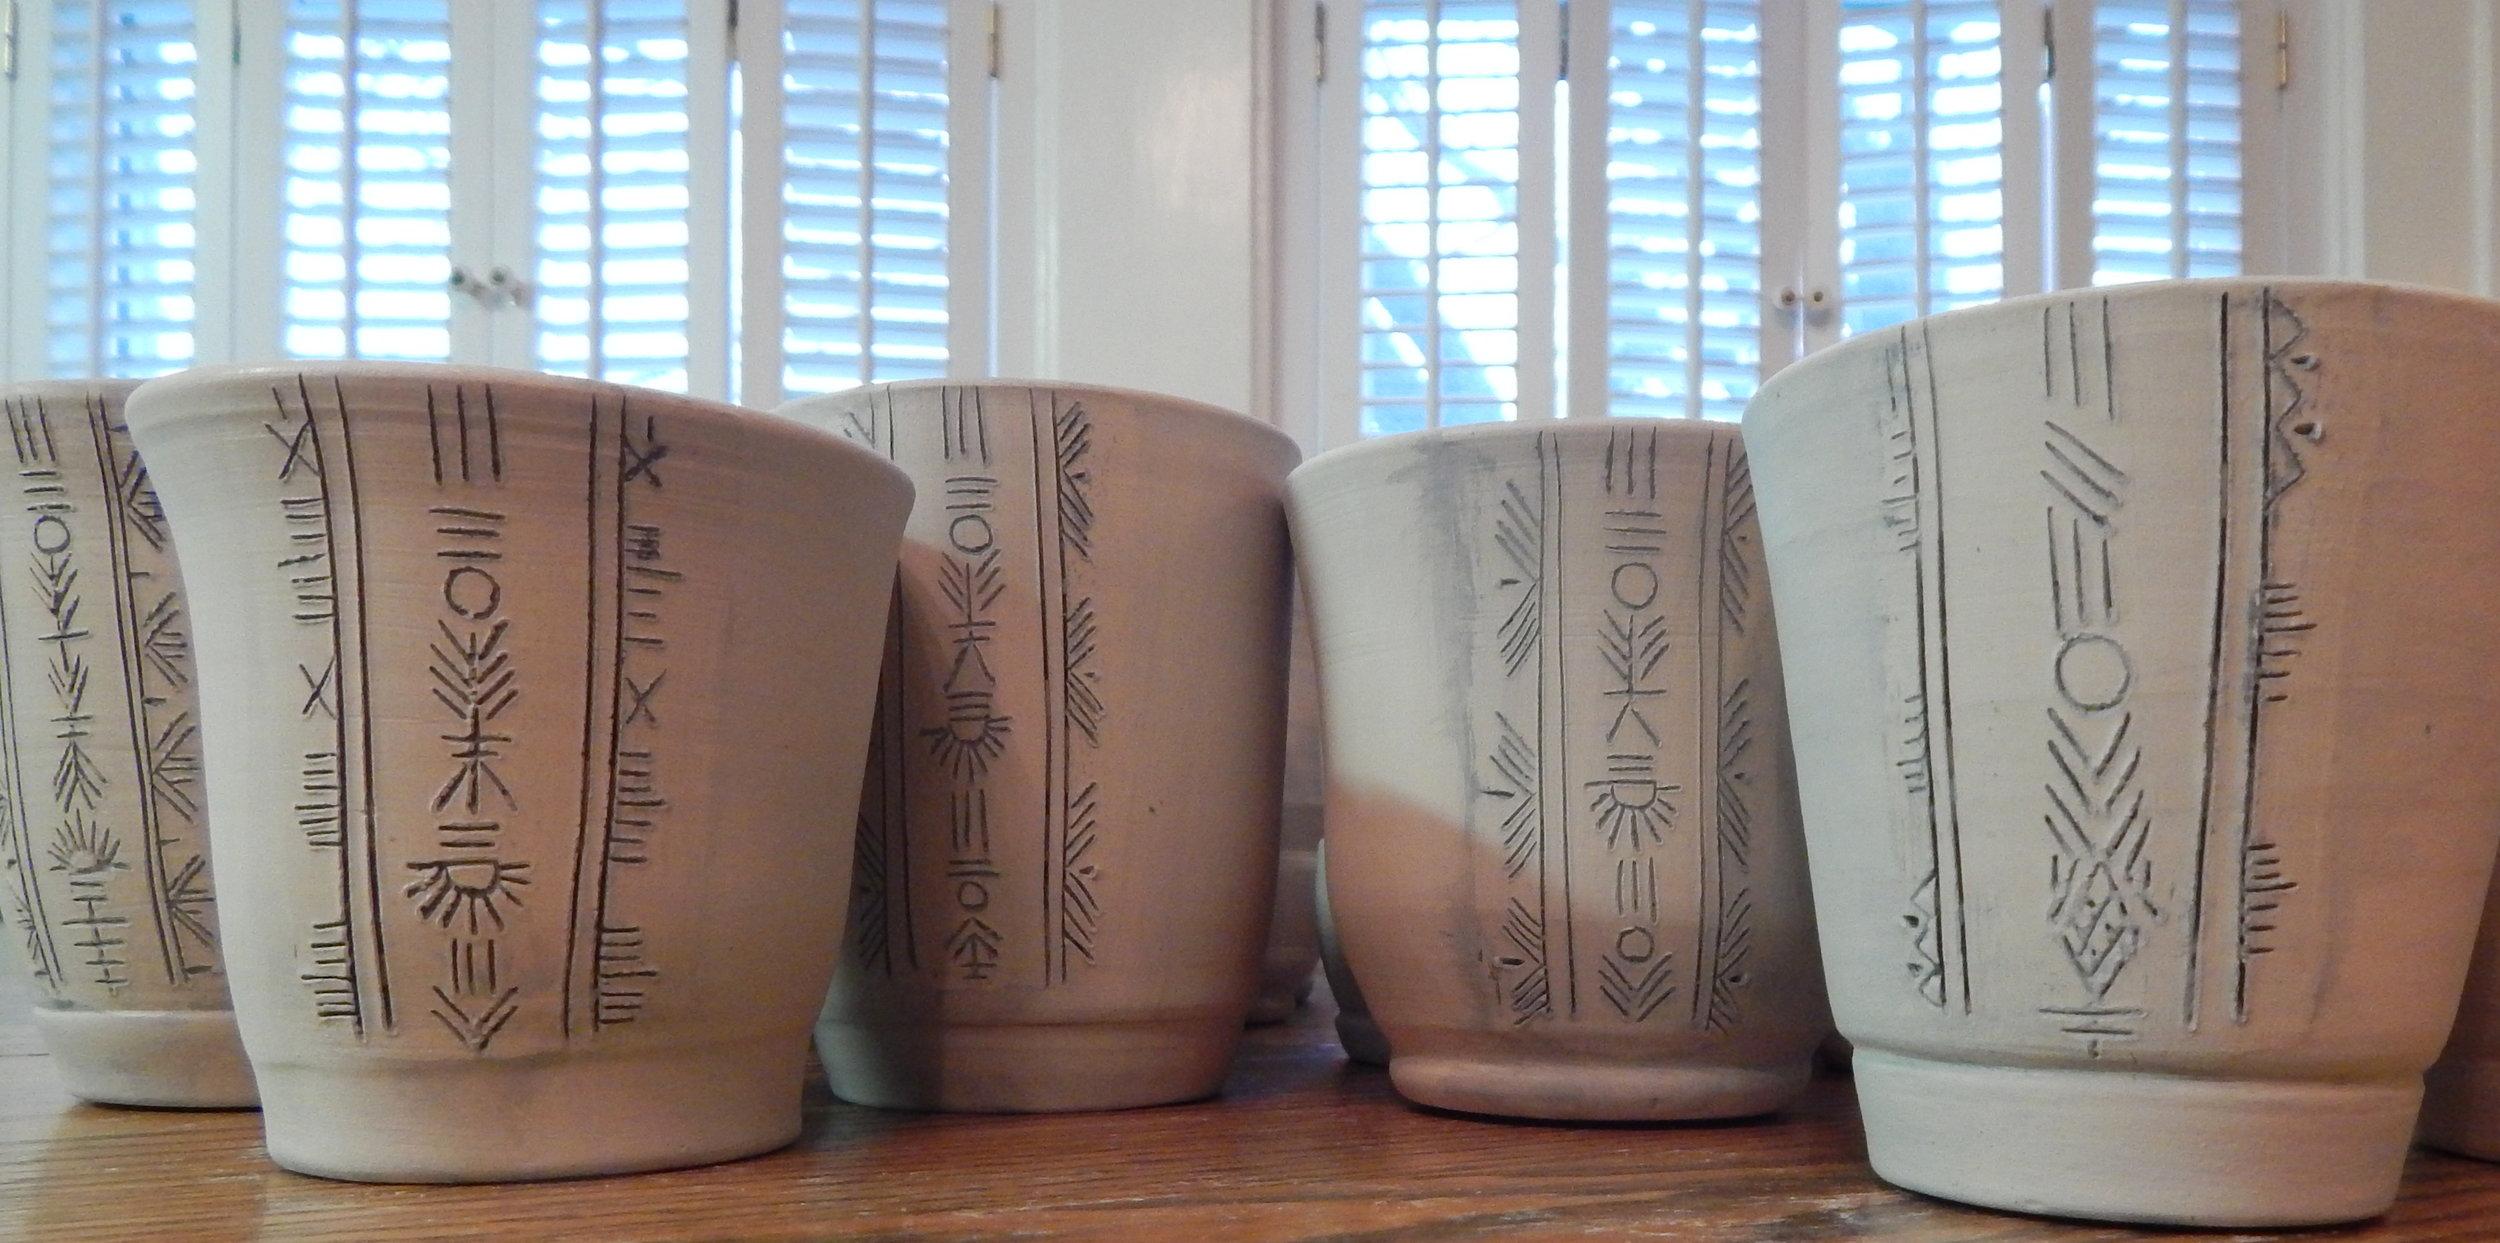 PotteryMugsMishima.jpg